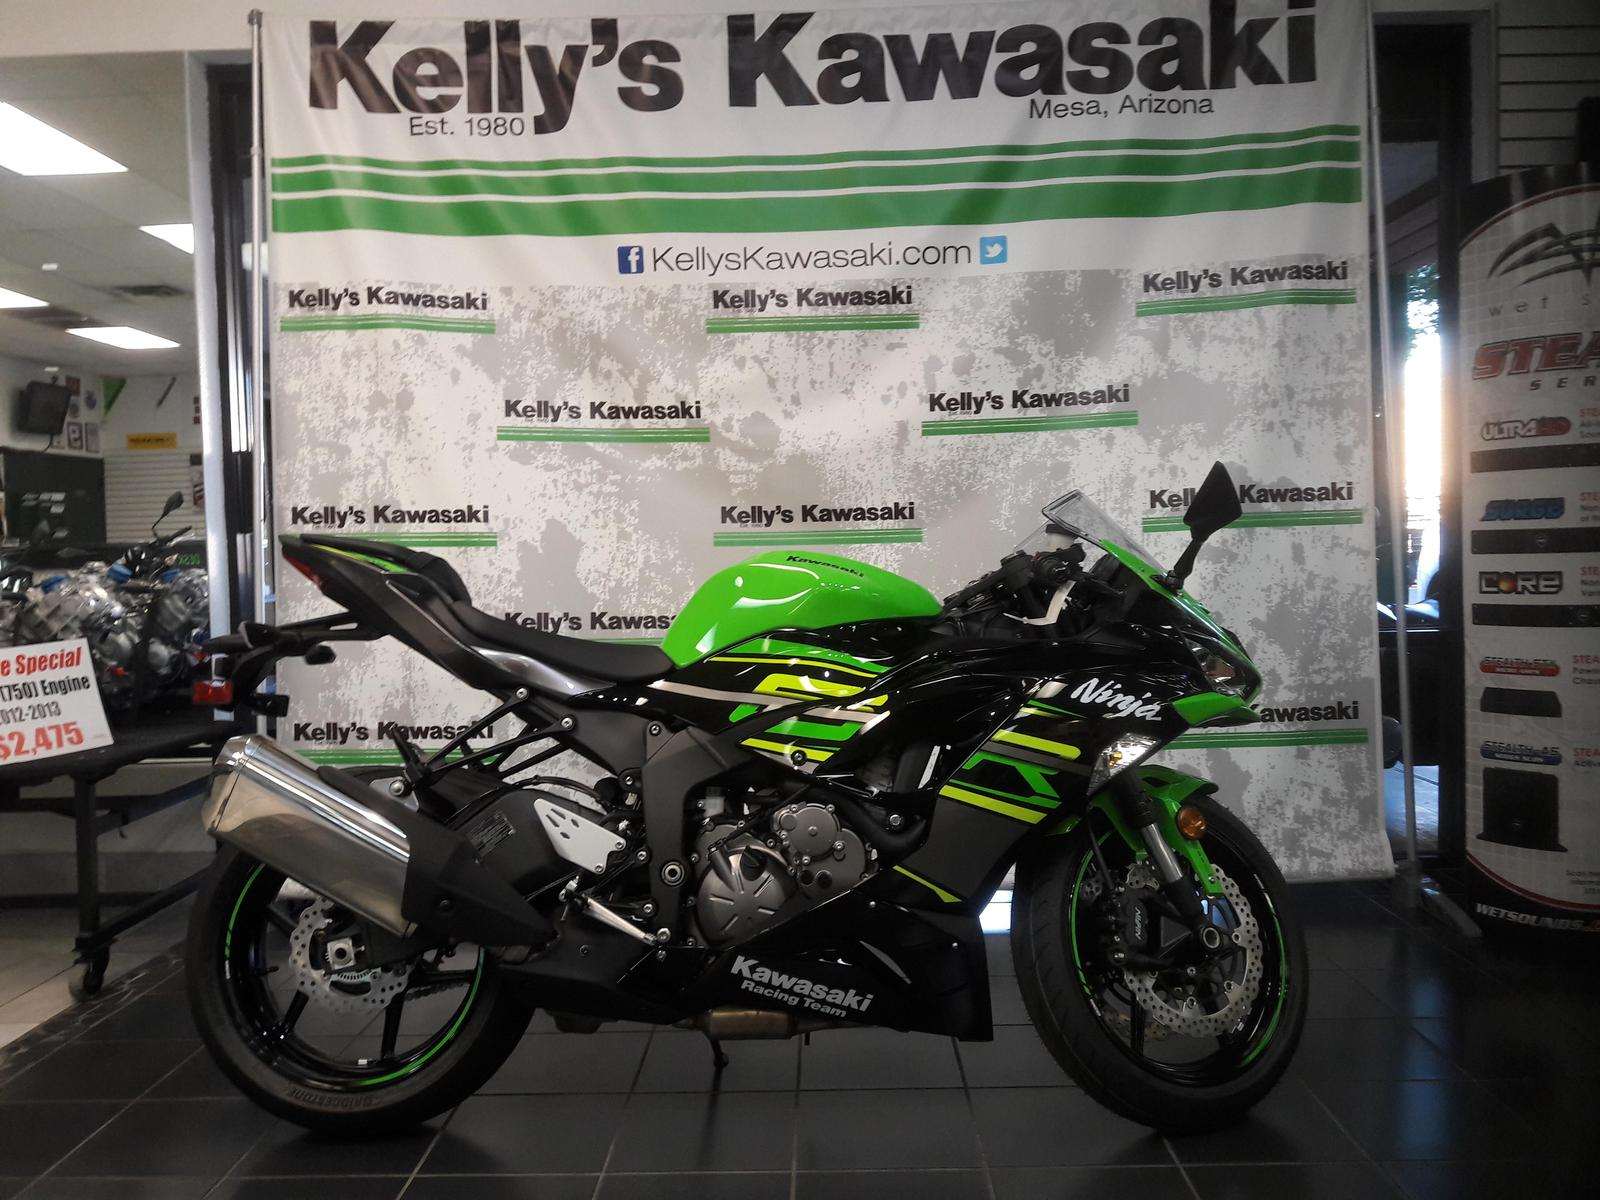 2019 Kawasaki Ninja Zx 6r Abs Krt Edition For Sale In Mesa Az